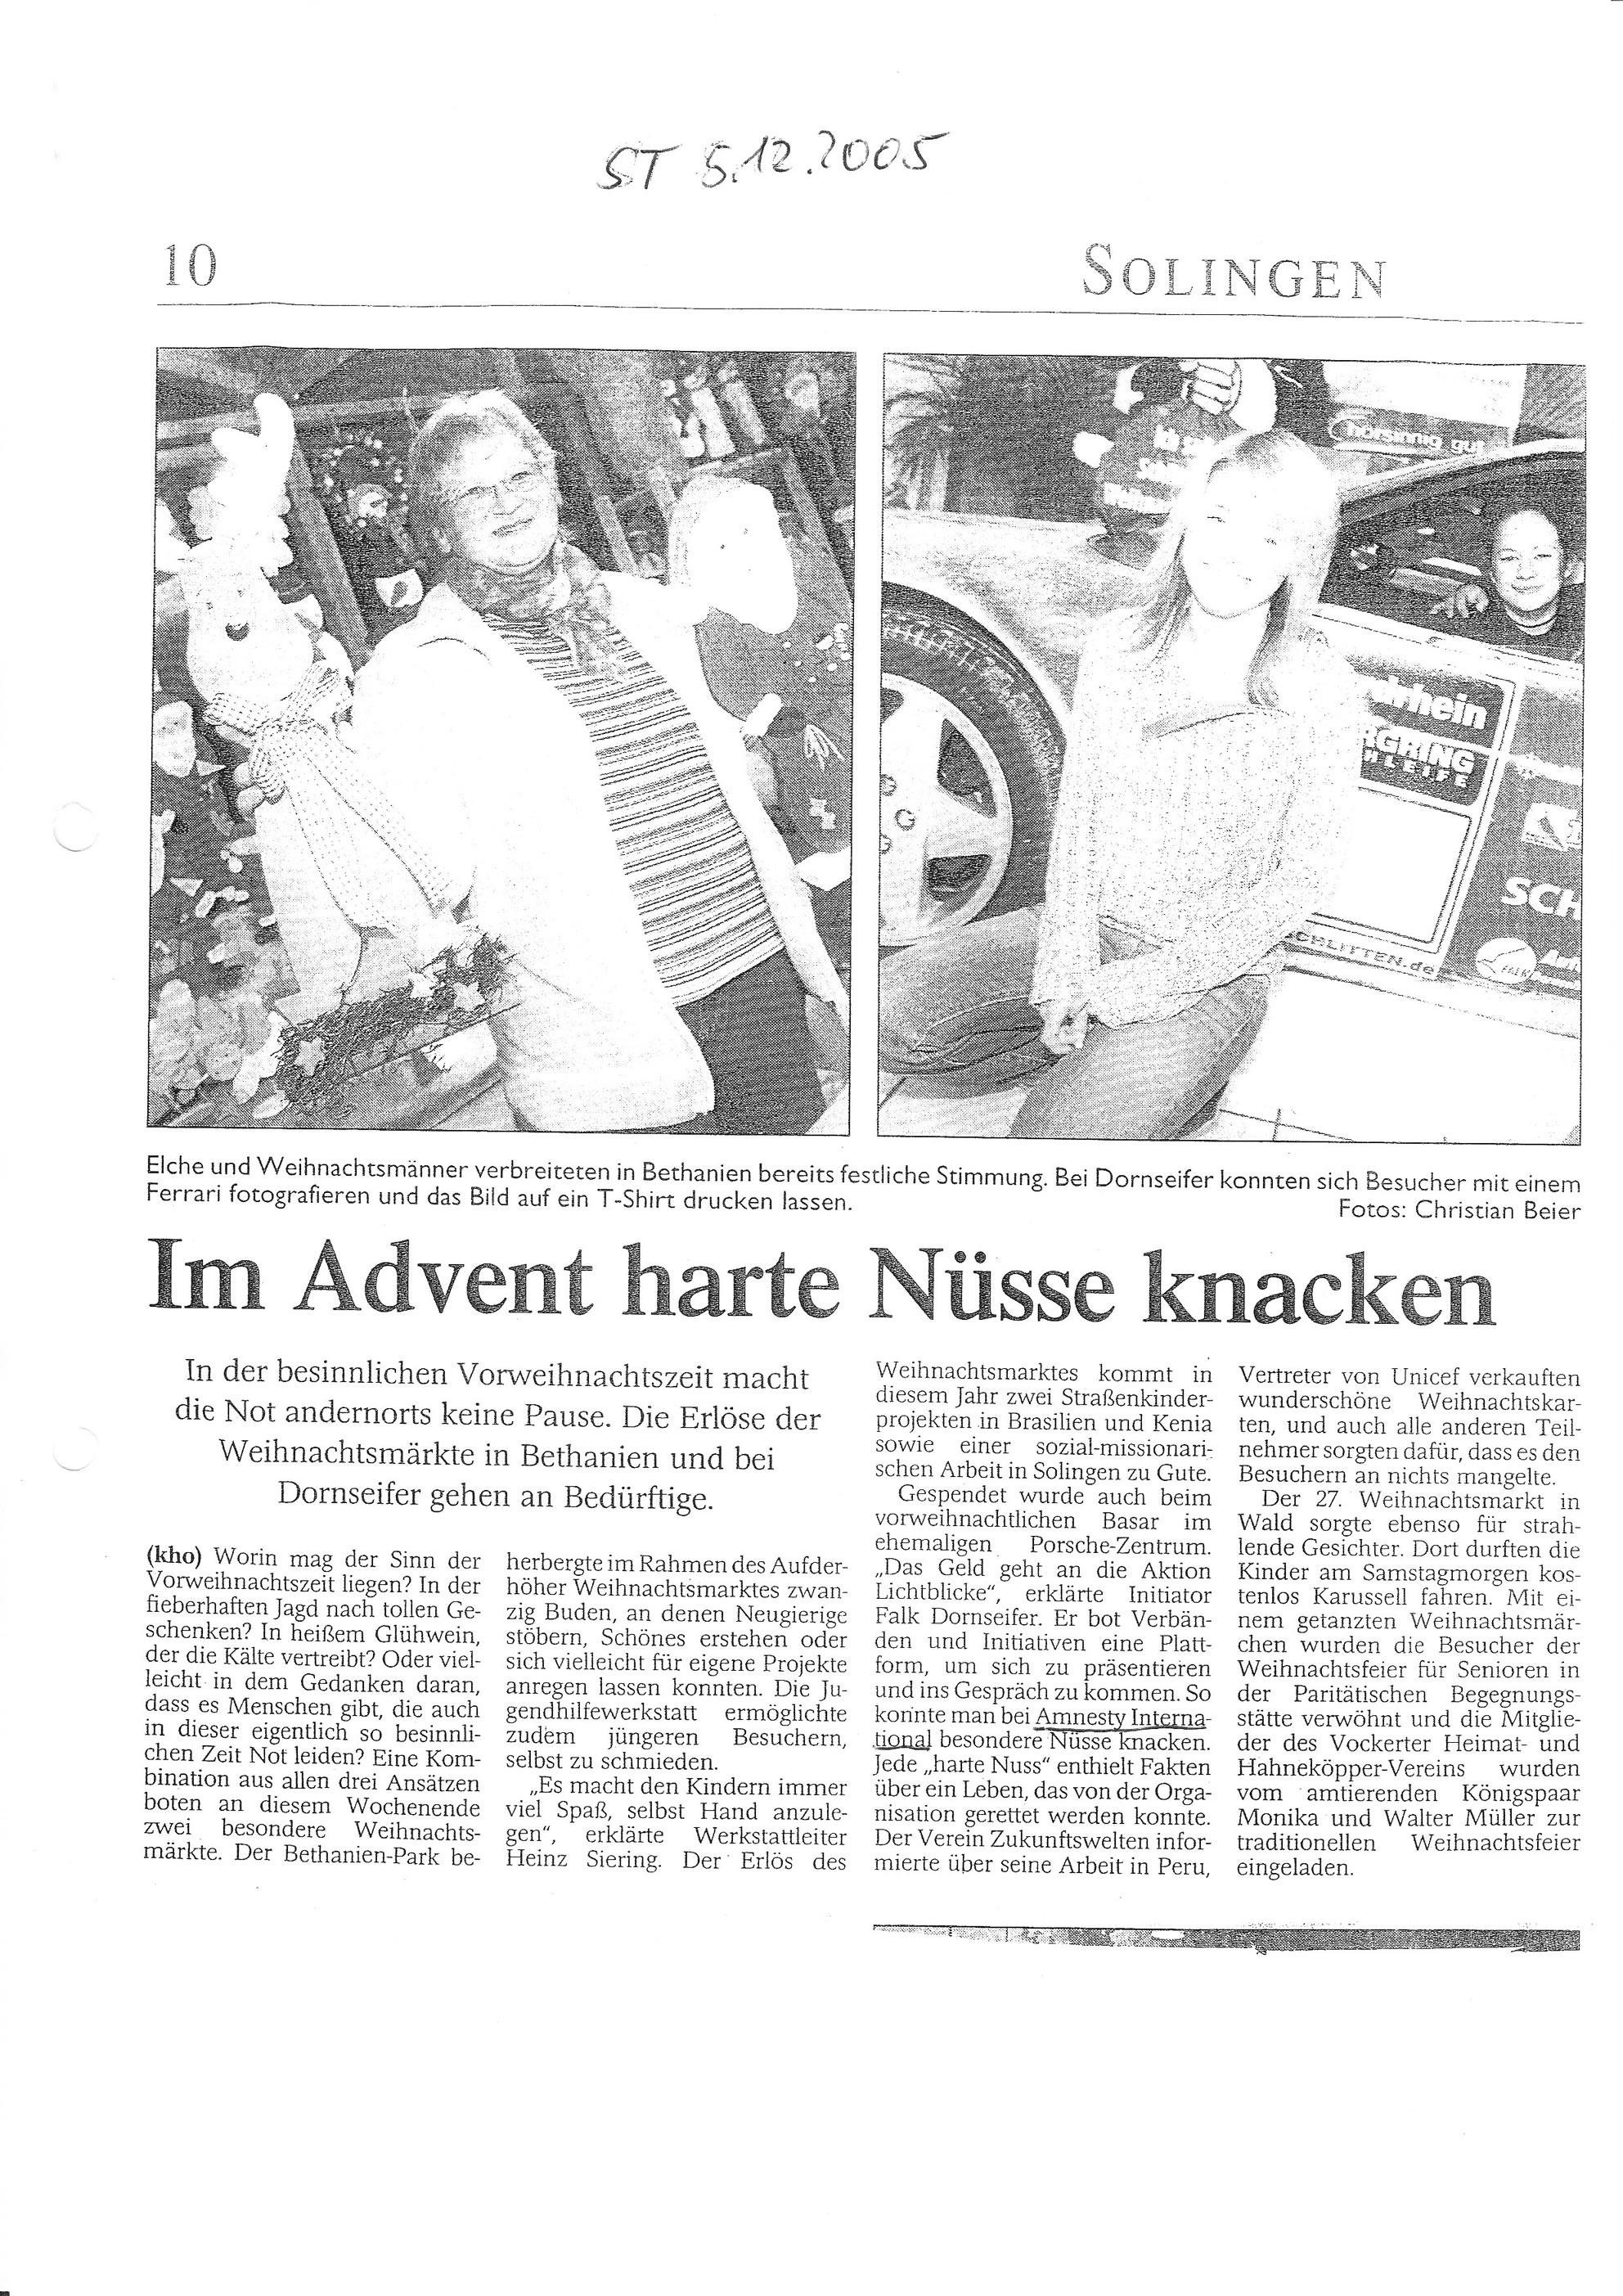 Solinger Tageblatt 12/05: Teilnahme Weihnachtsmarkt